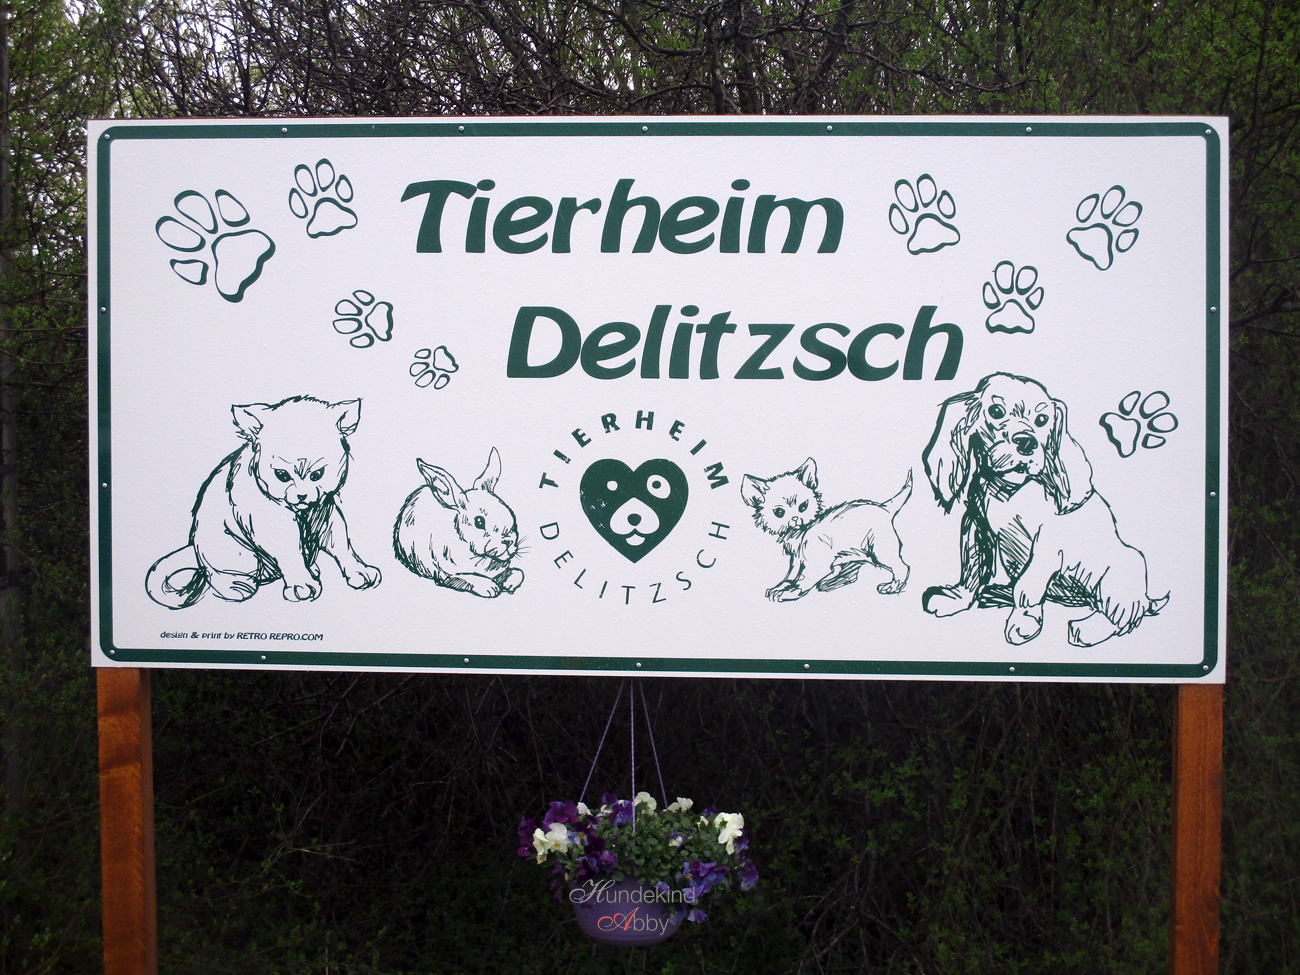 Tierheim Delitzsch